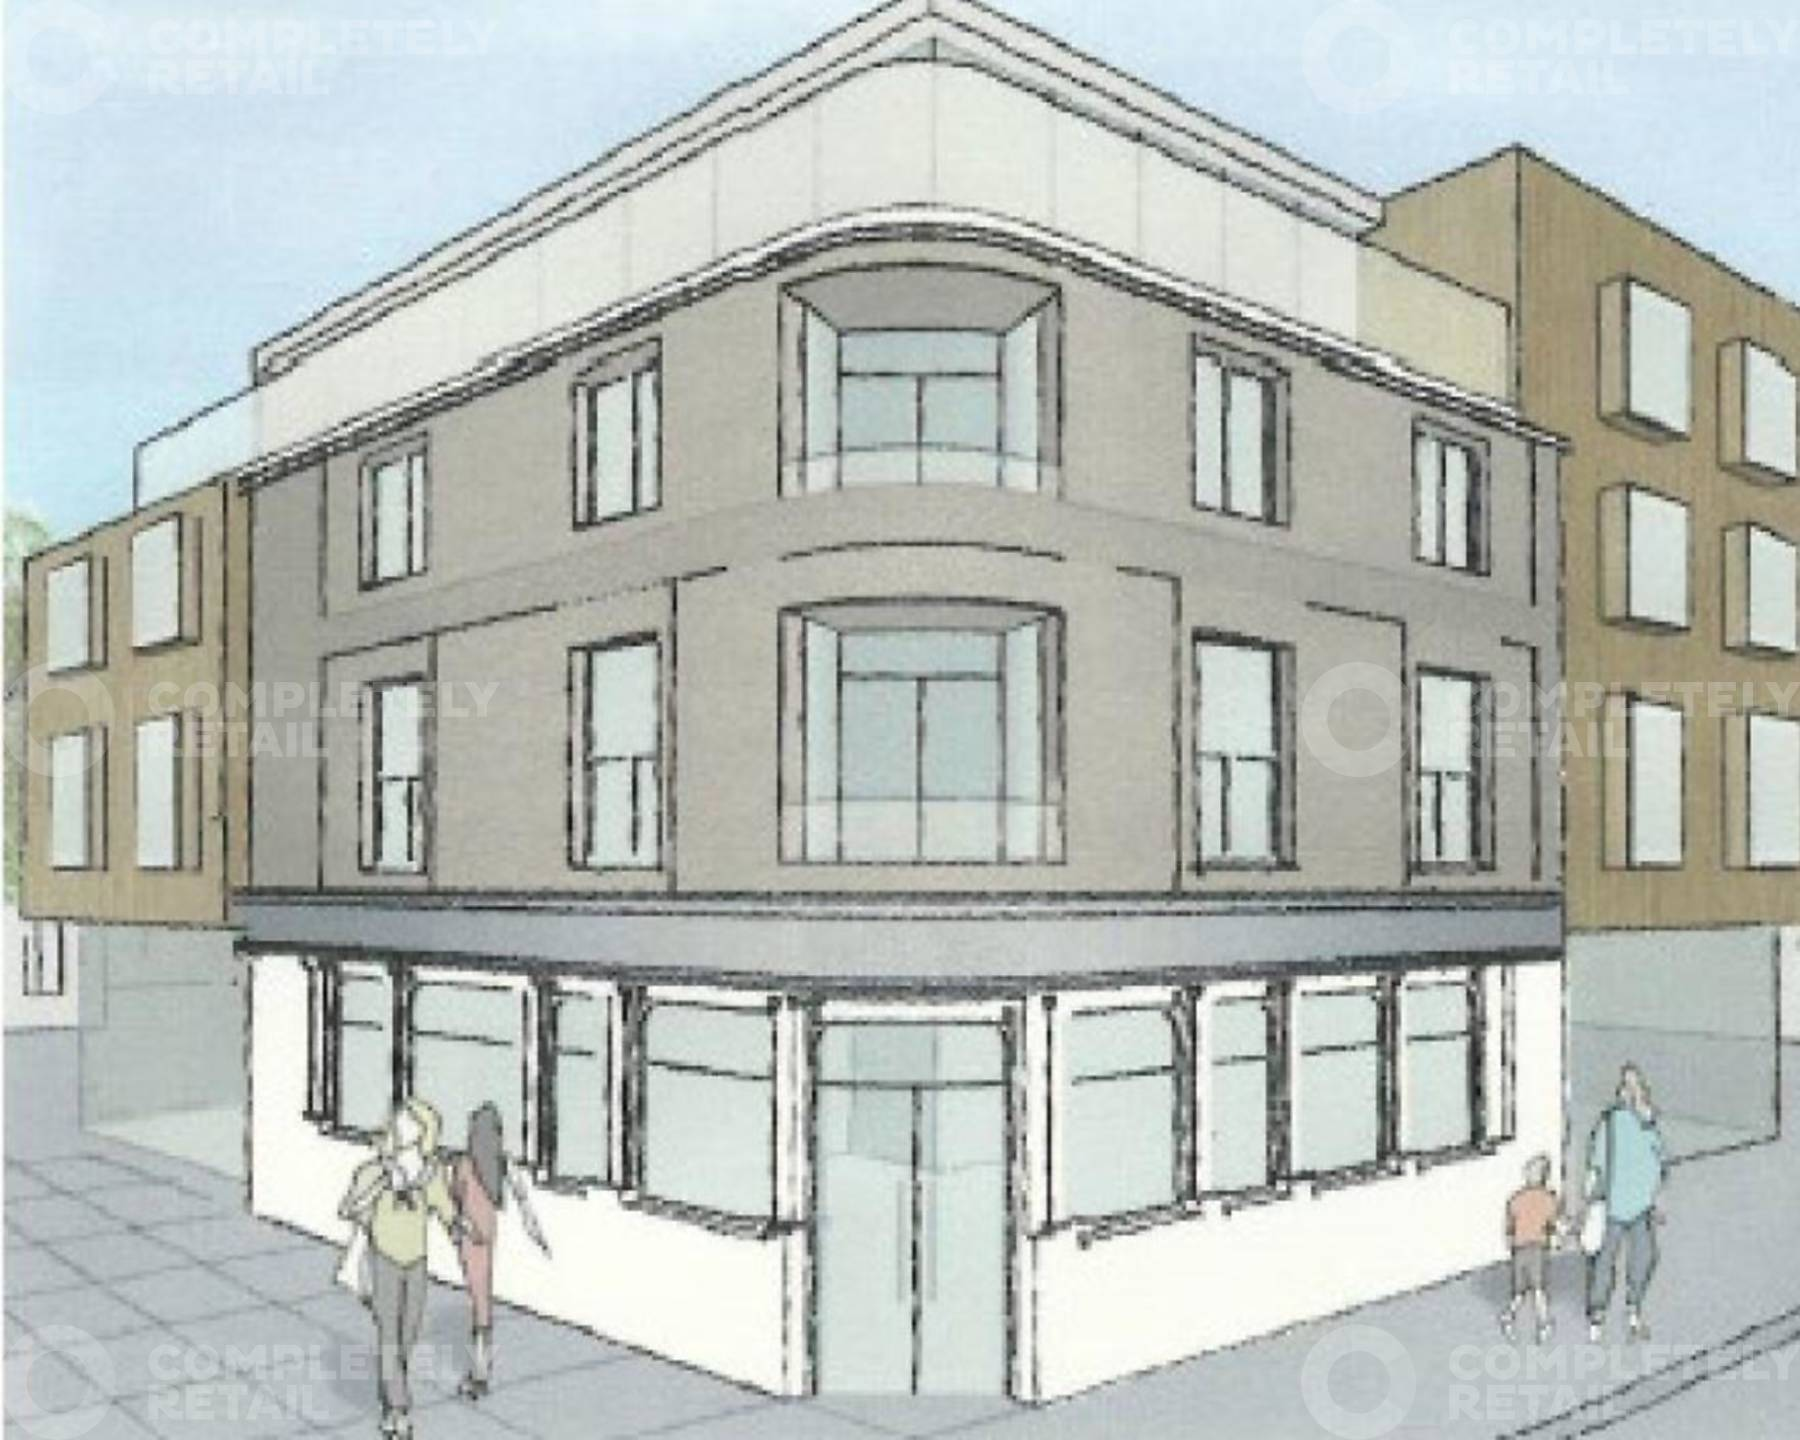 185 Bow Common Lane